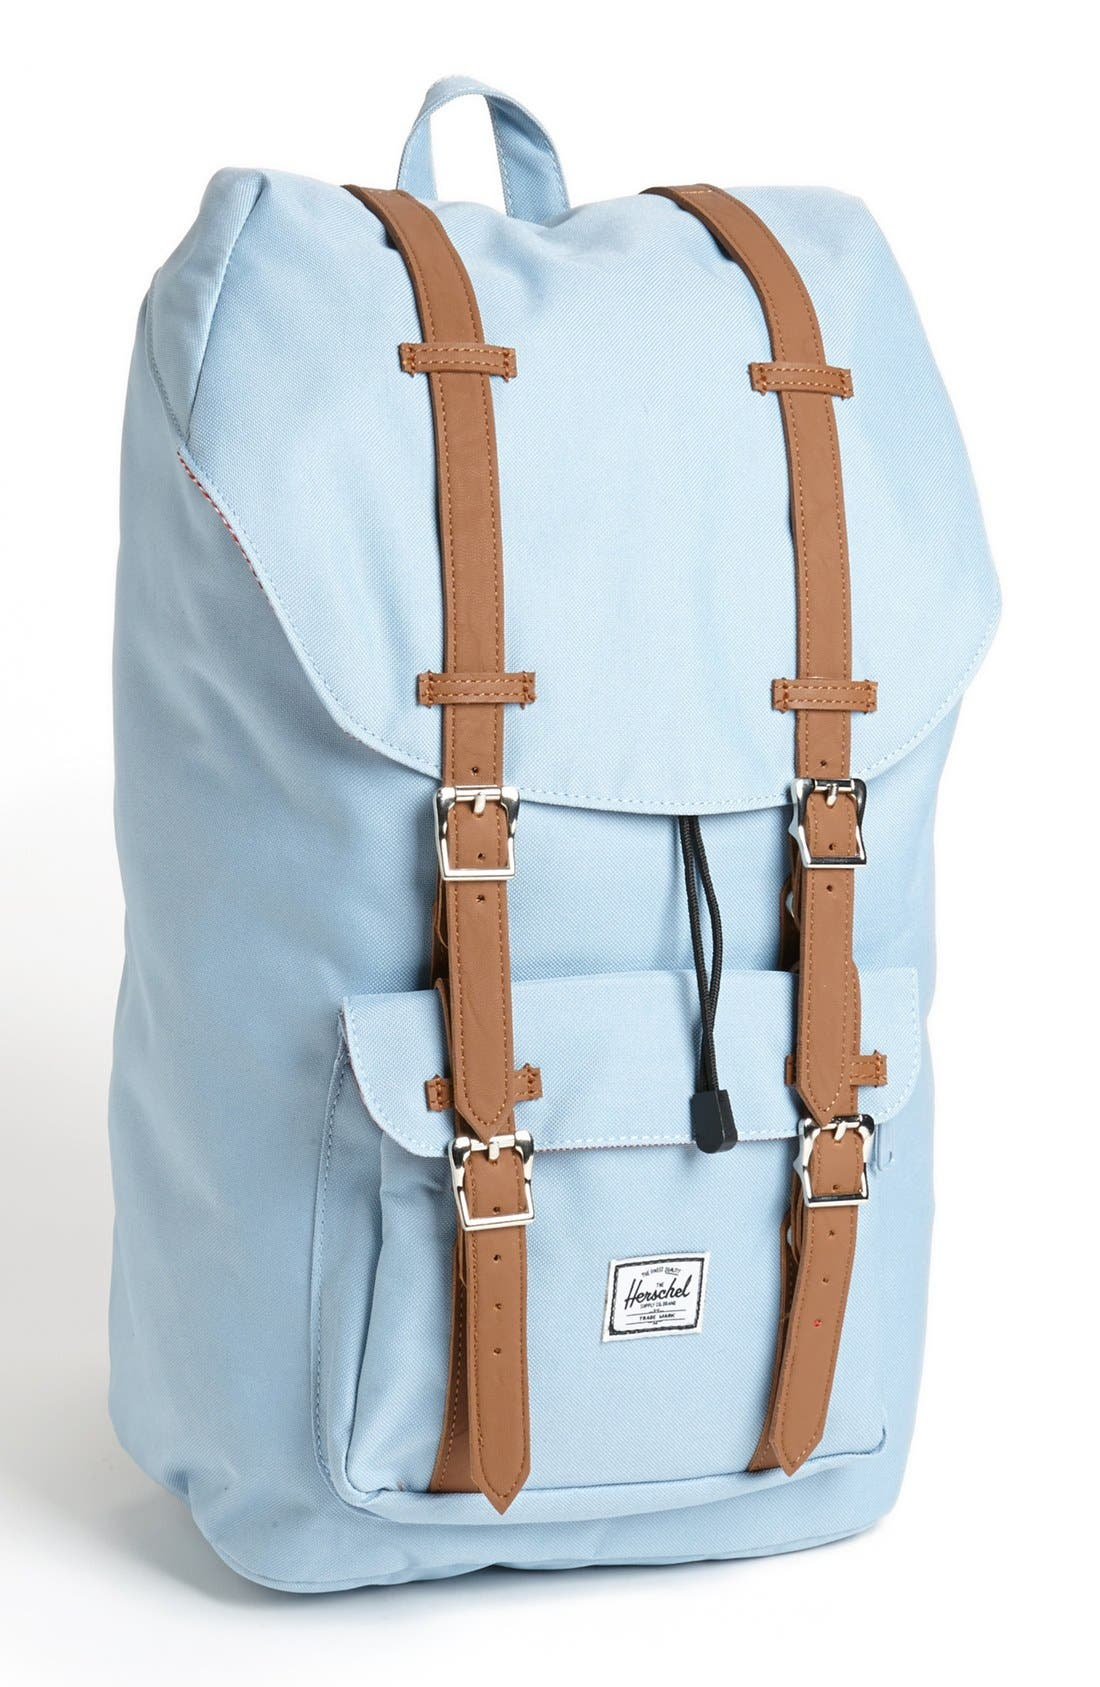 'Little America' Backpack,                             Main thumbnail 1, color,                             Steel Blue